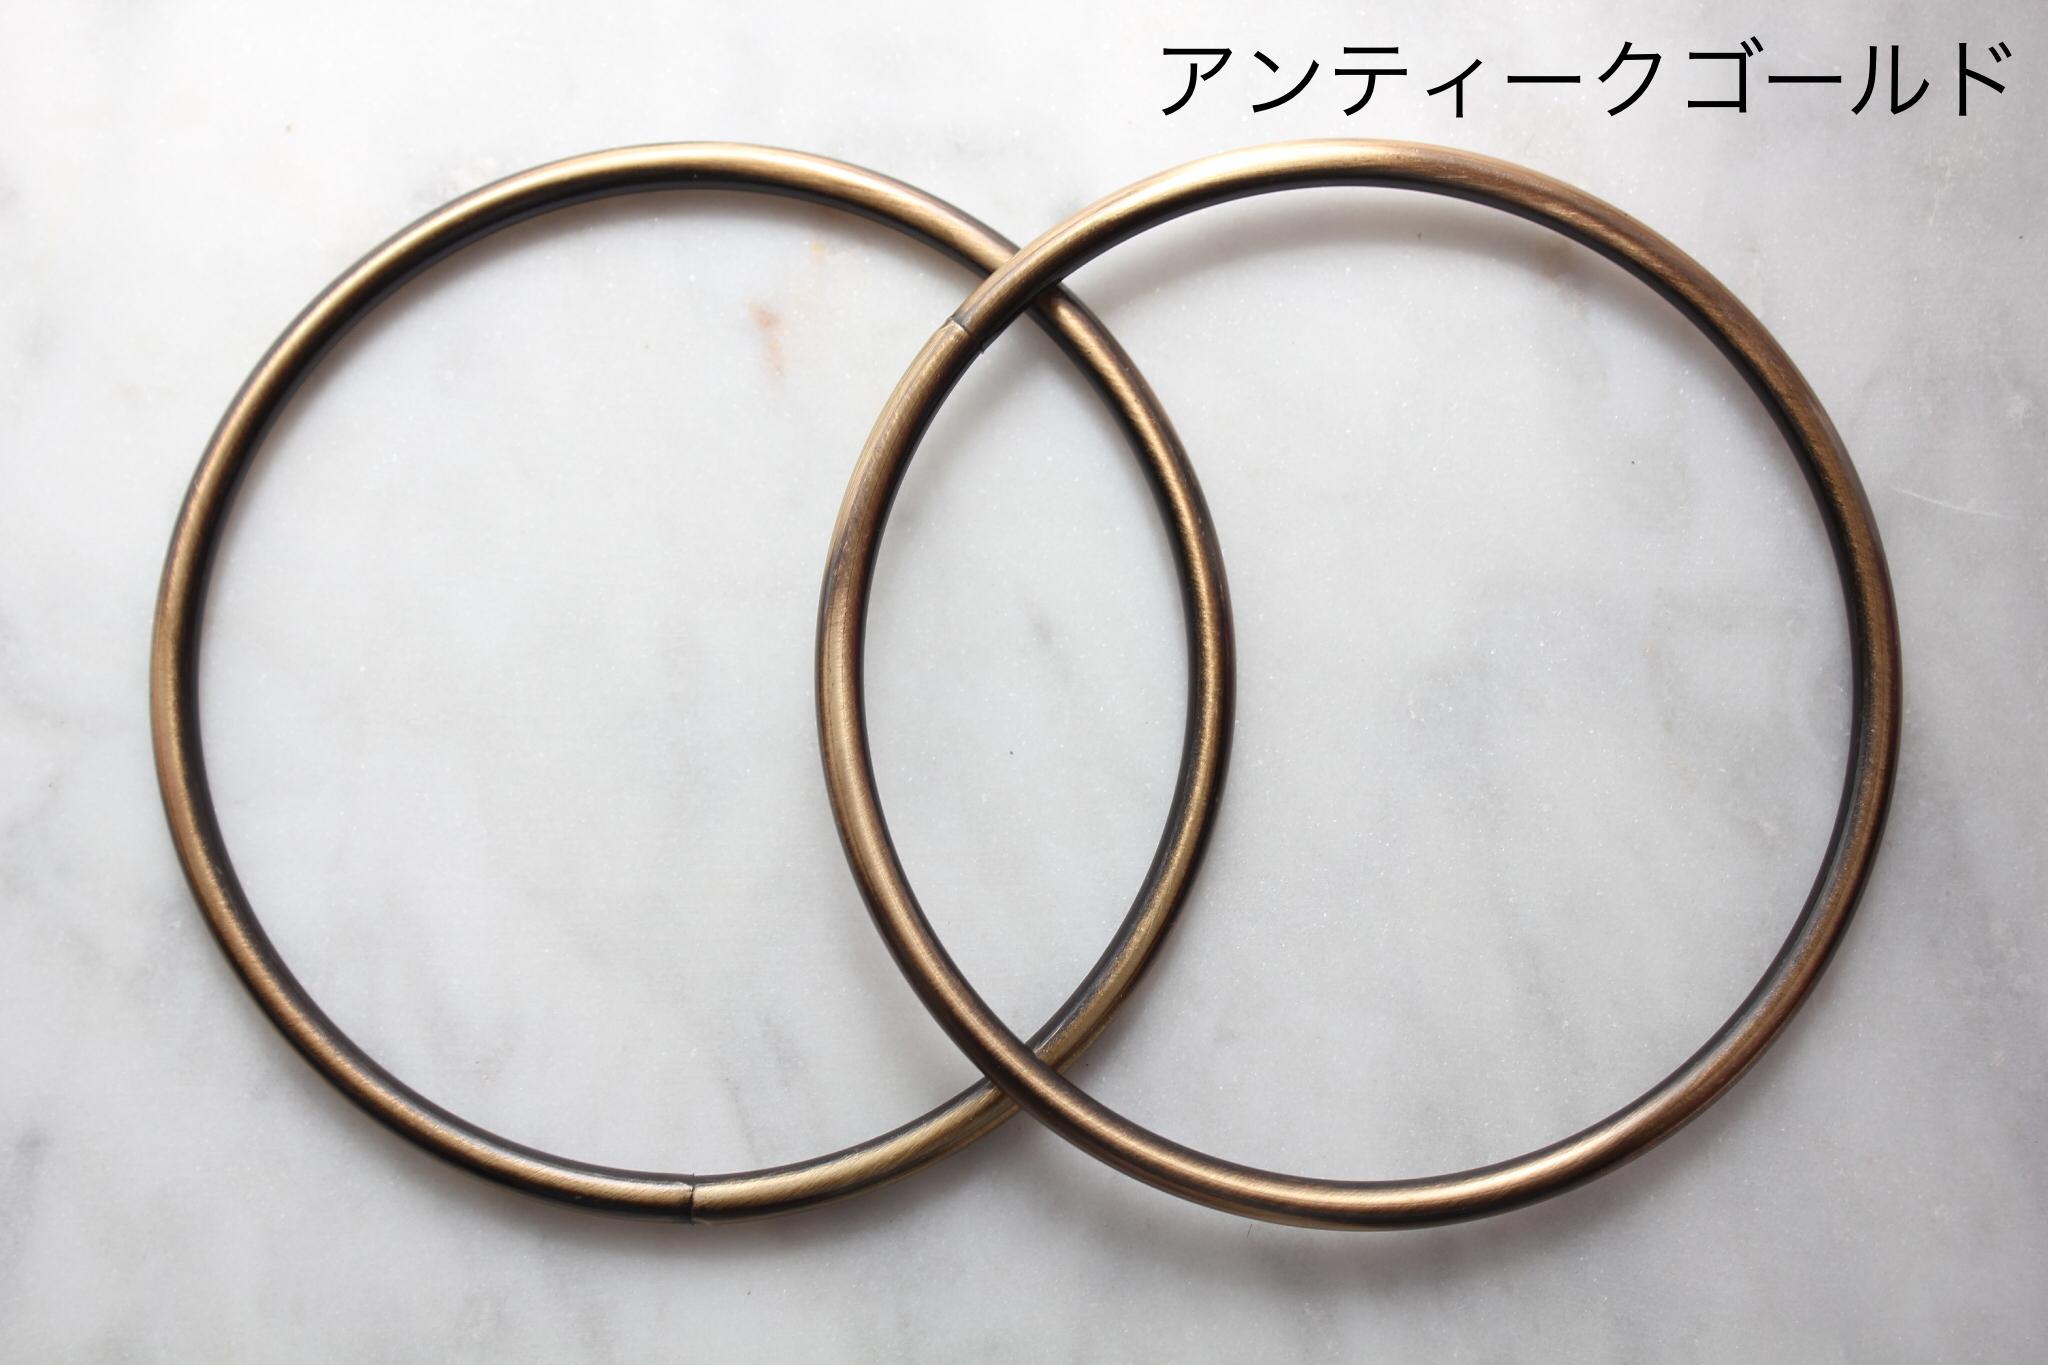 【SSF SELECT】リングハンドル外径10cm(2本1組)